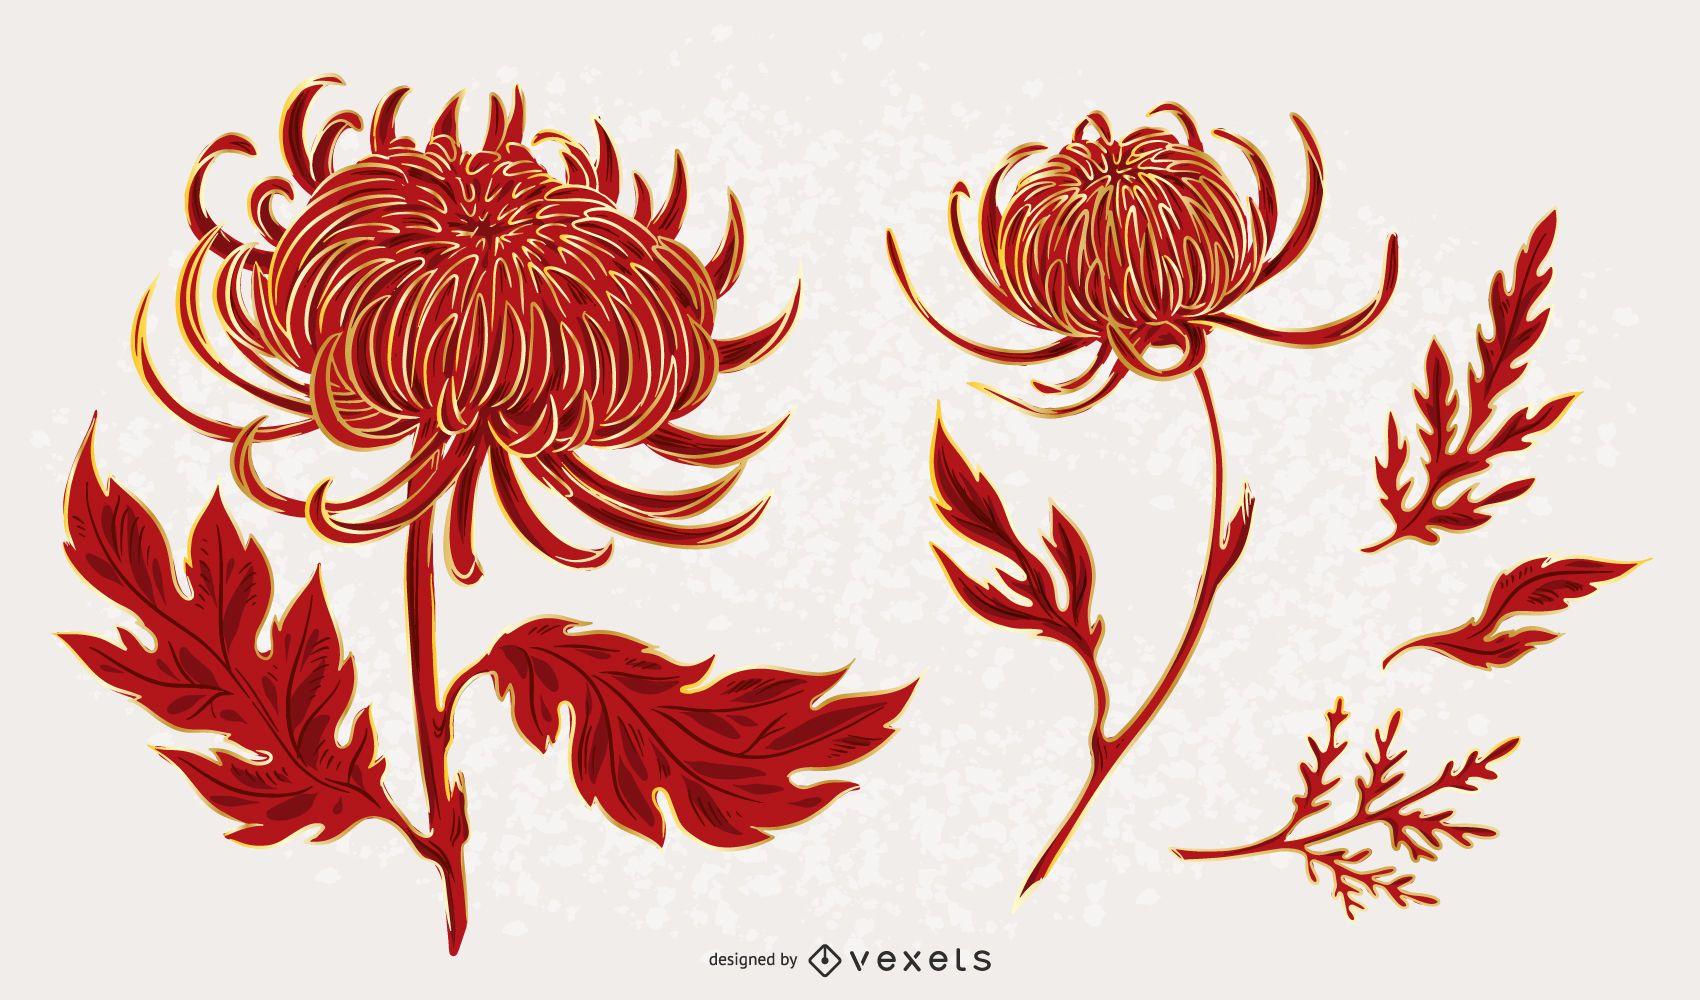 Chrysanthemum Flower Illustration set